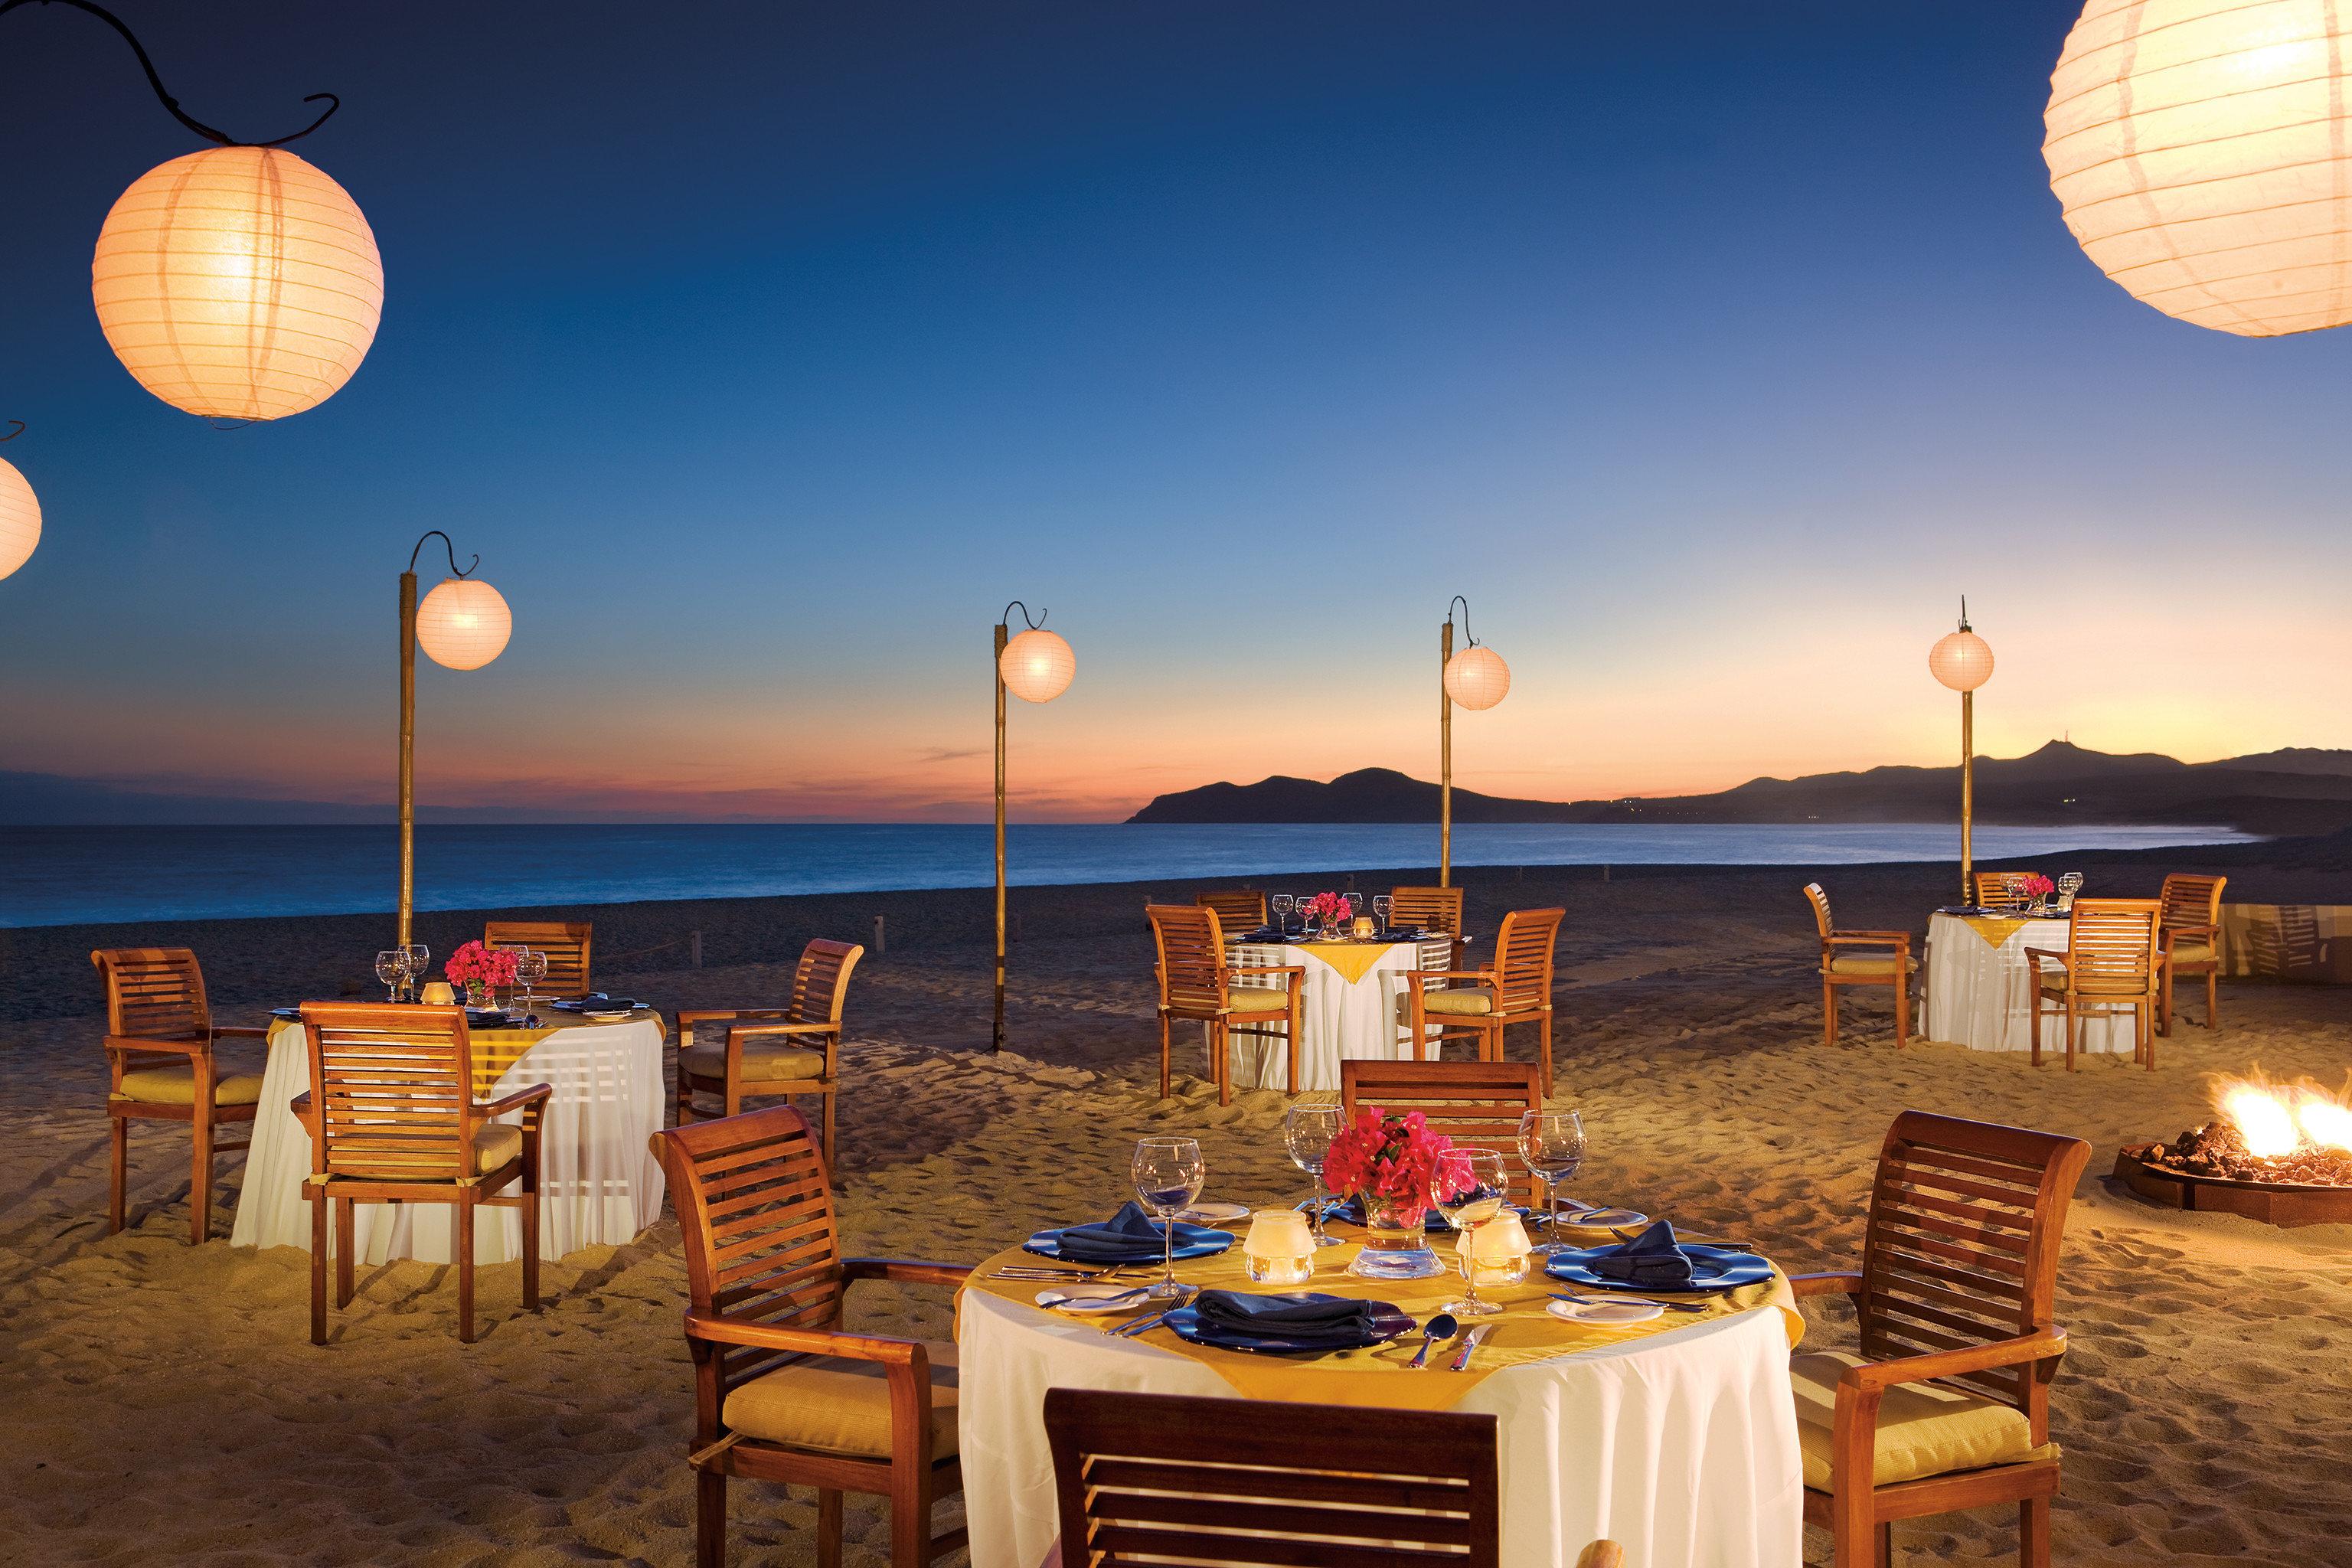 Bar Budget Dining Drink Eat Elegant Hotels Luxury Modern sky chair evening lighting restaurant Resort set Sunset day